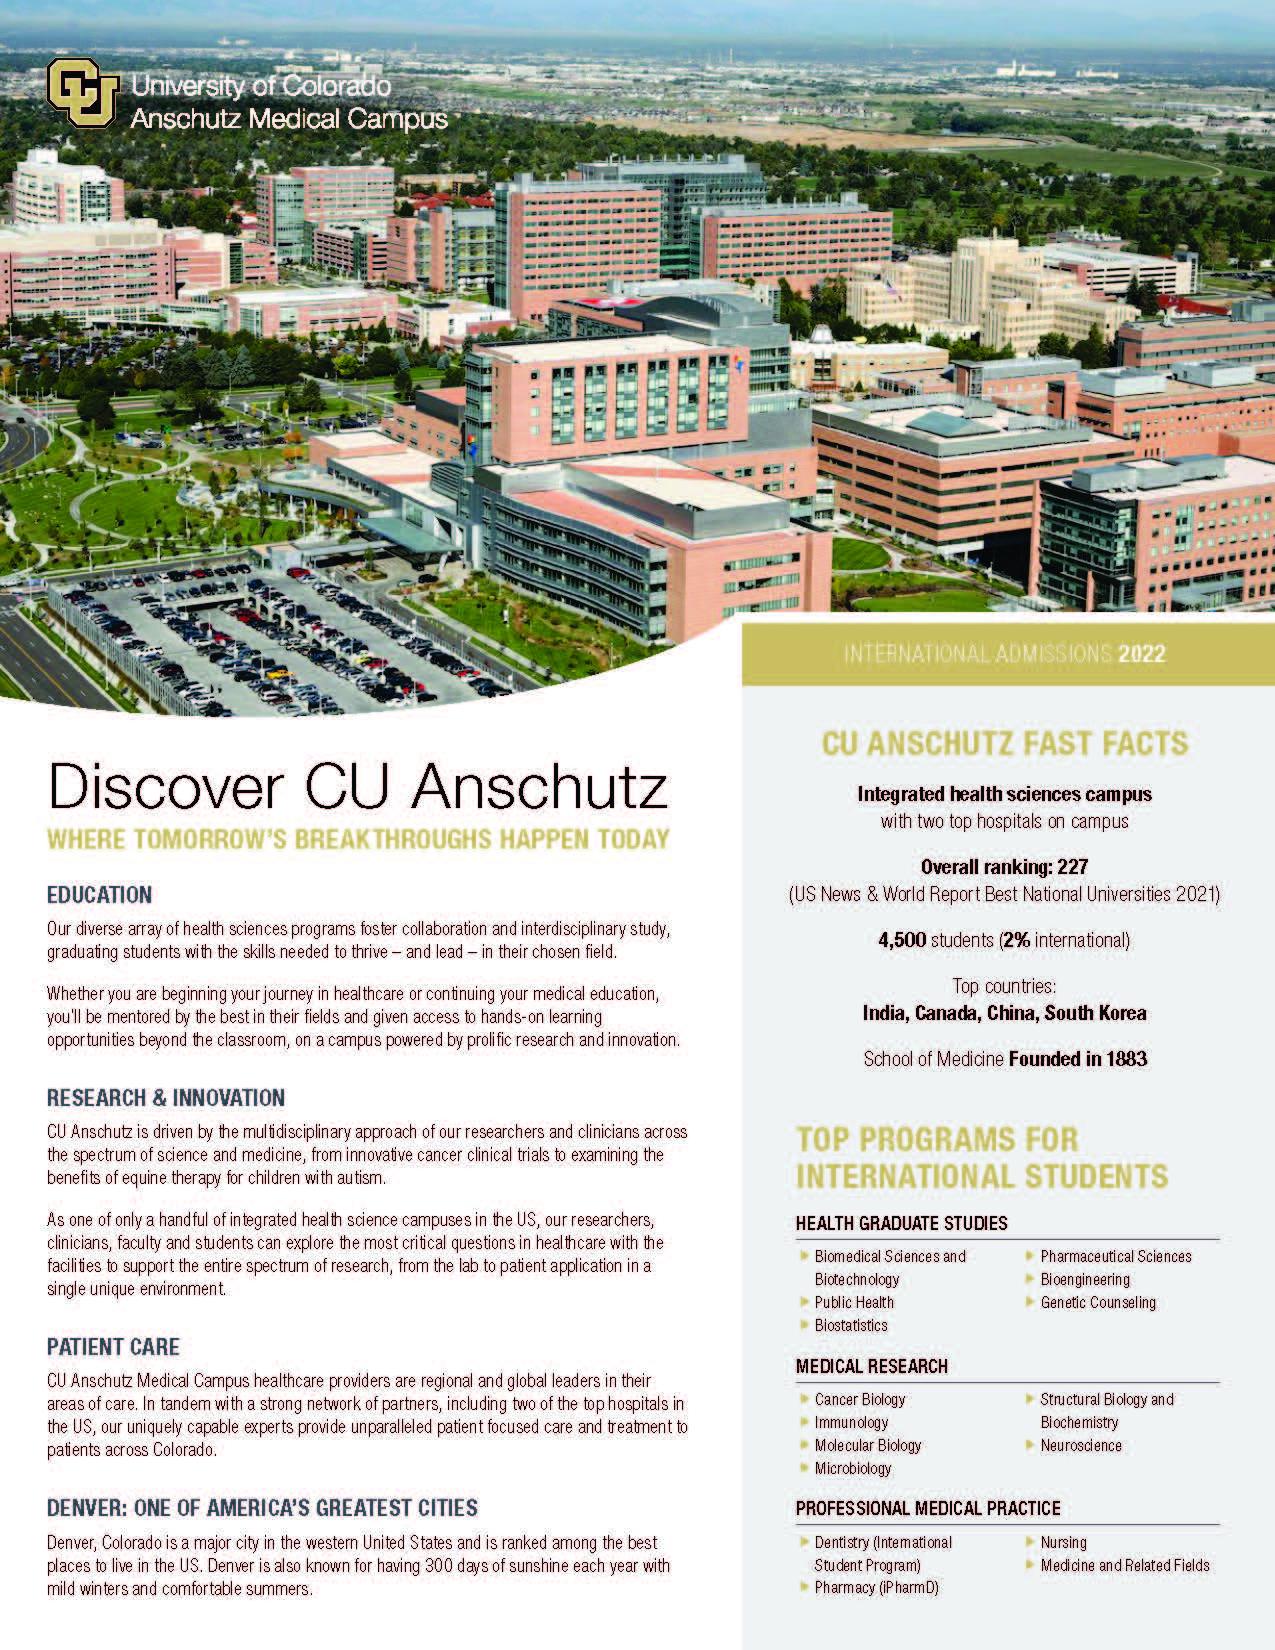 Discover CU Anschutz